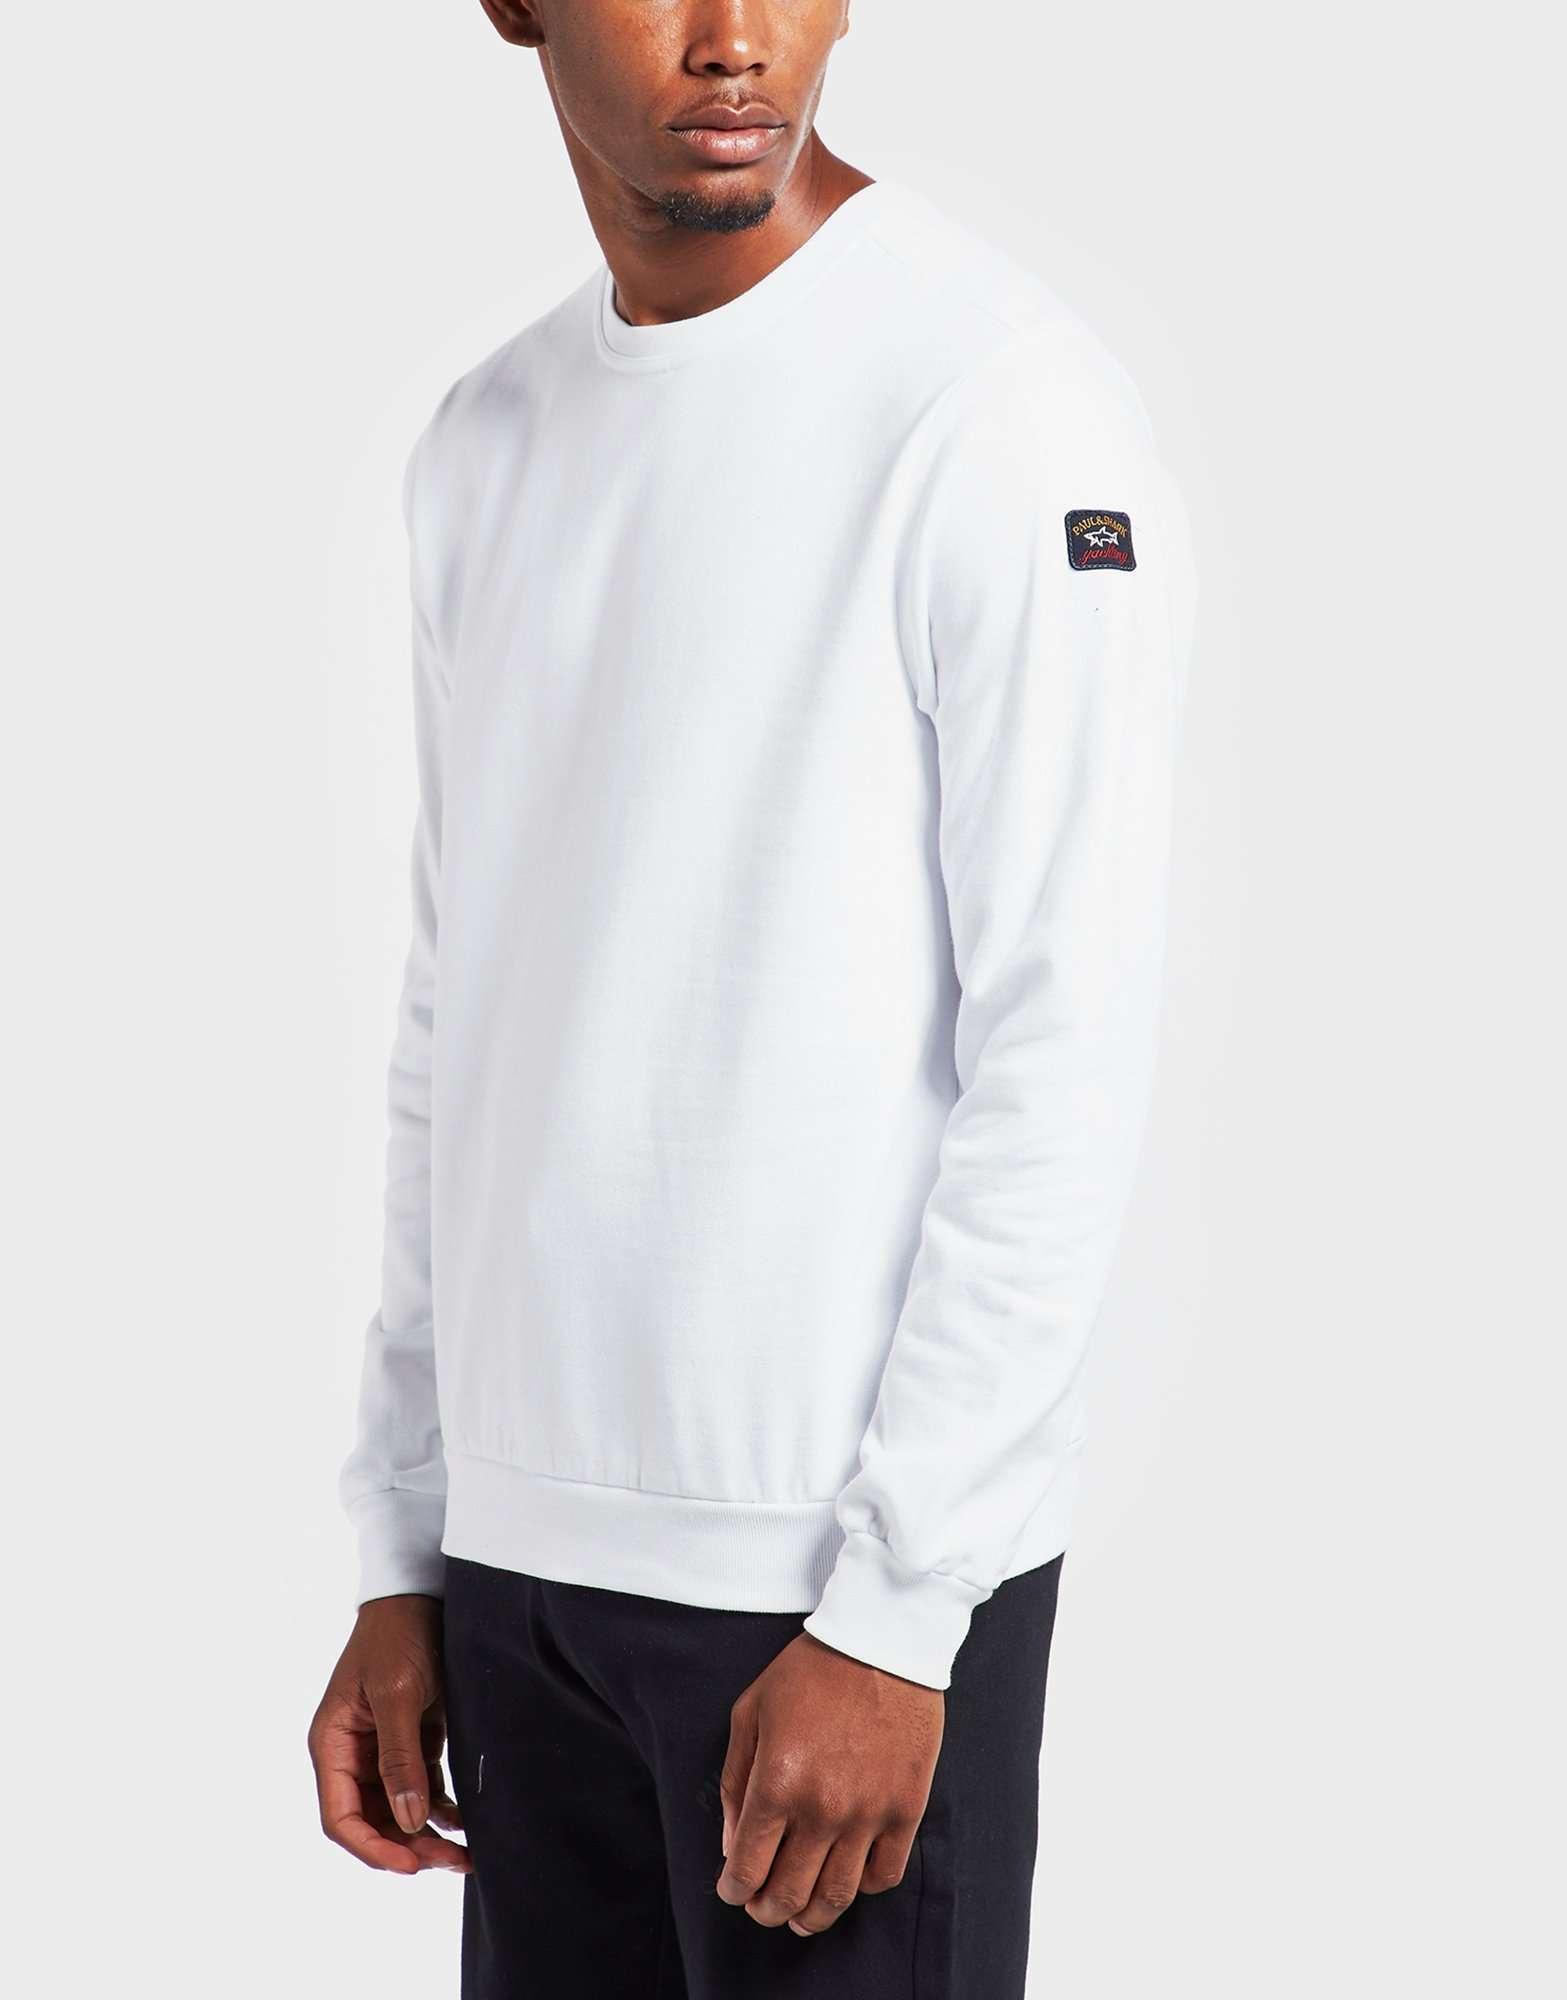 Paul and Shark Fleece Crew Sweatshirt